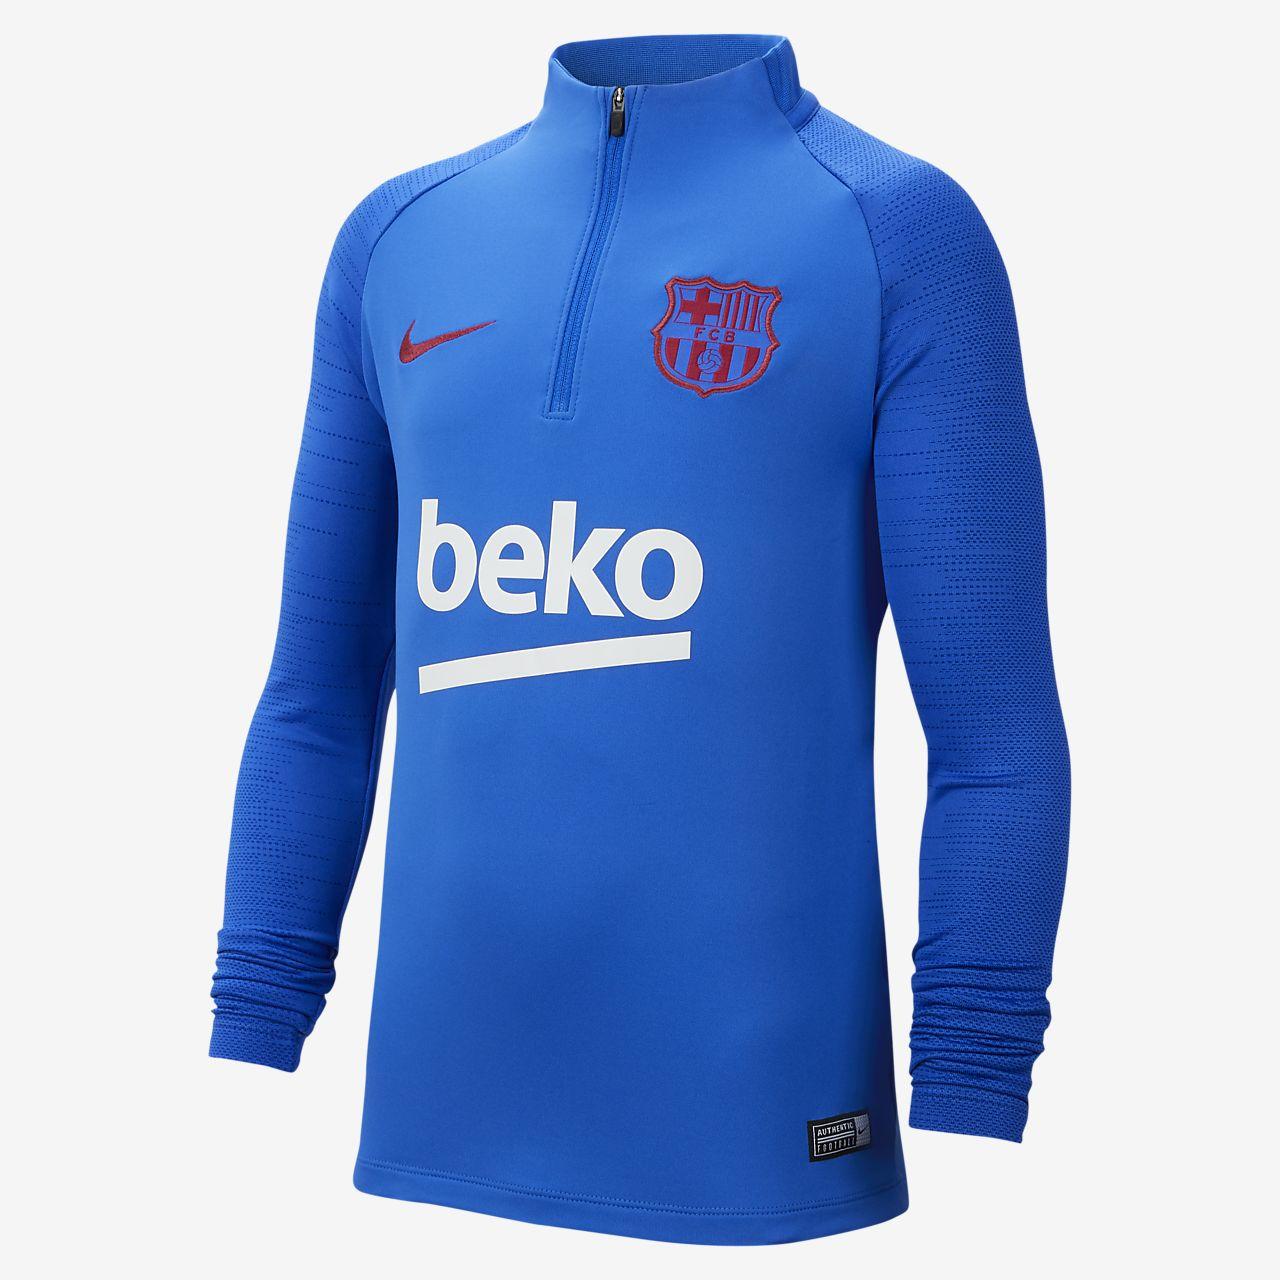 Camisola de treino de futebol Nike Dri-FIT FC Barcelona Strike Júnior